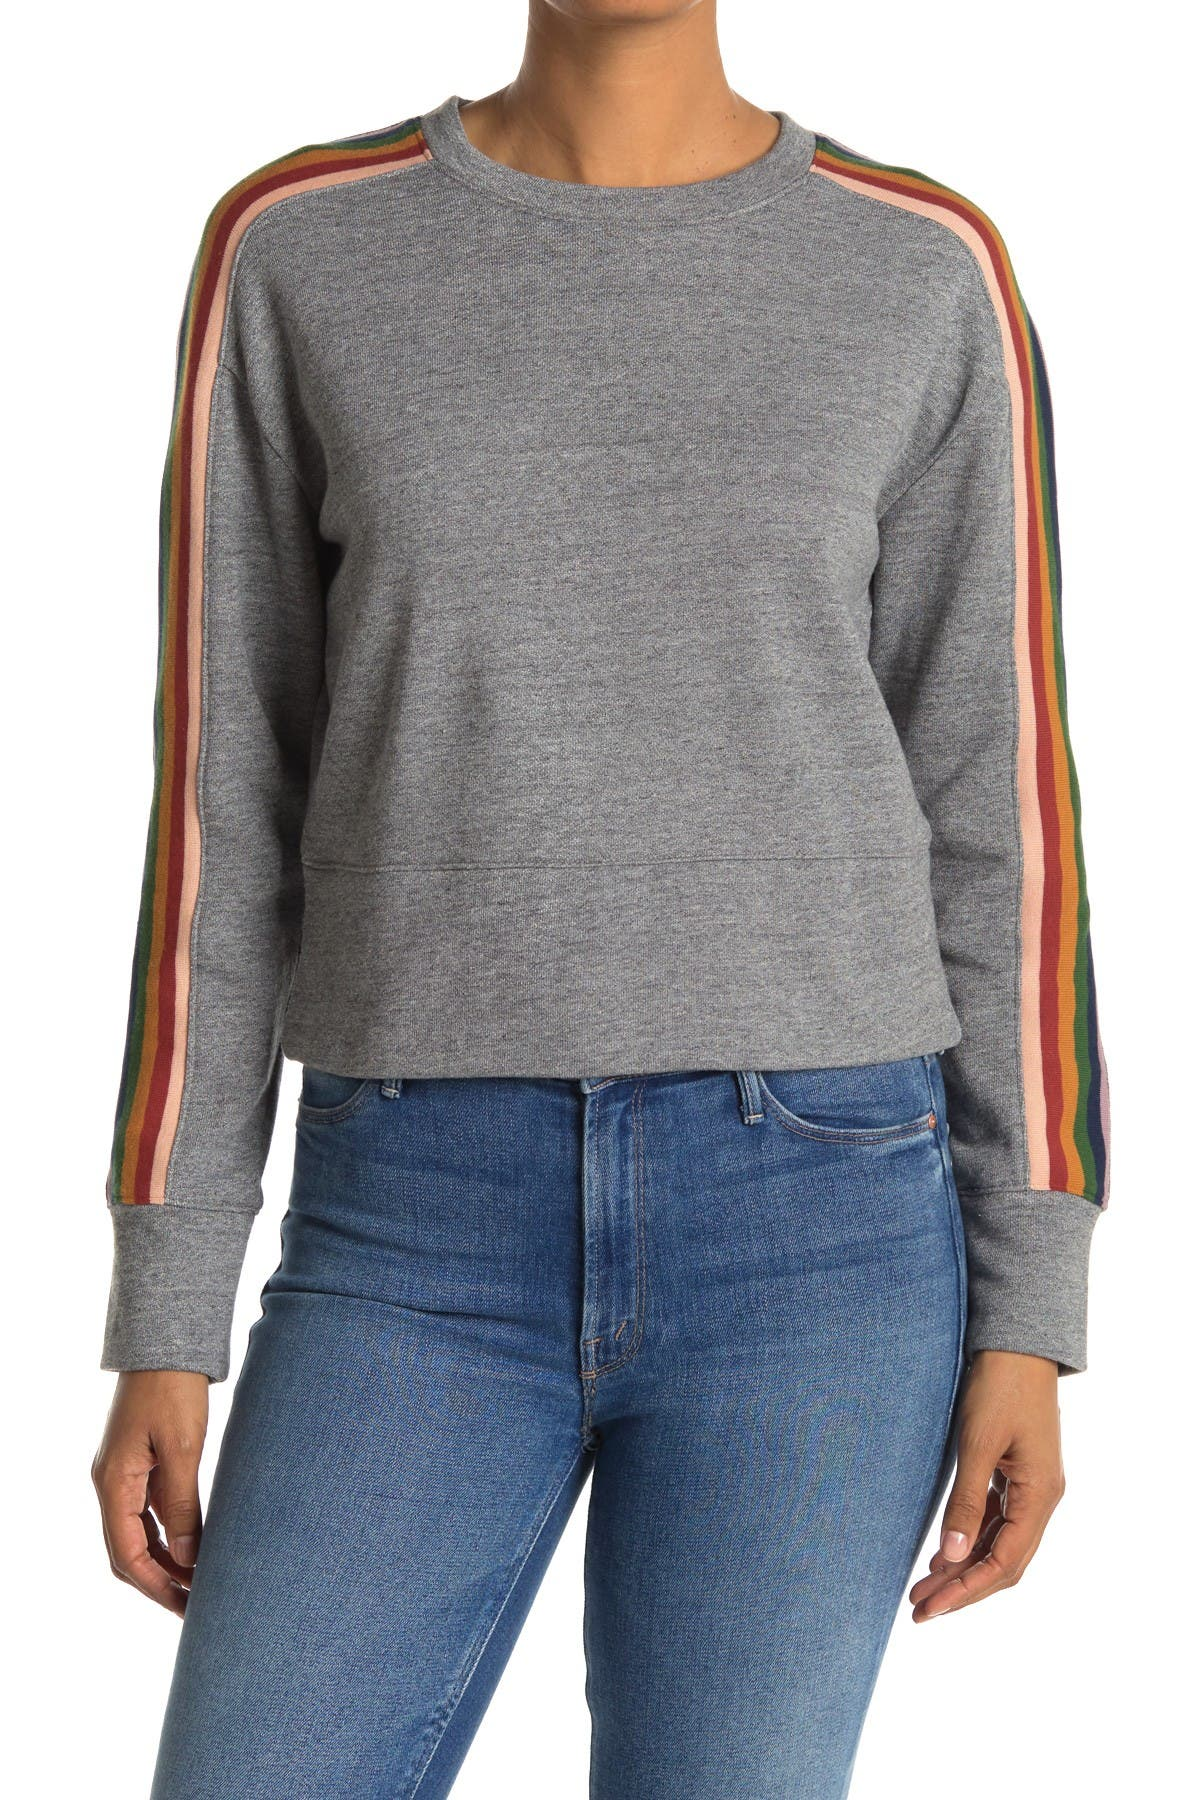 Image of Madewell Rainbow Stripe Crop Sweater